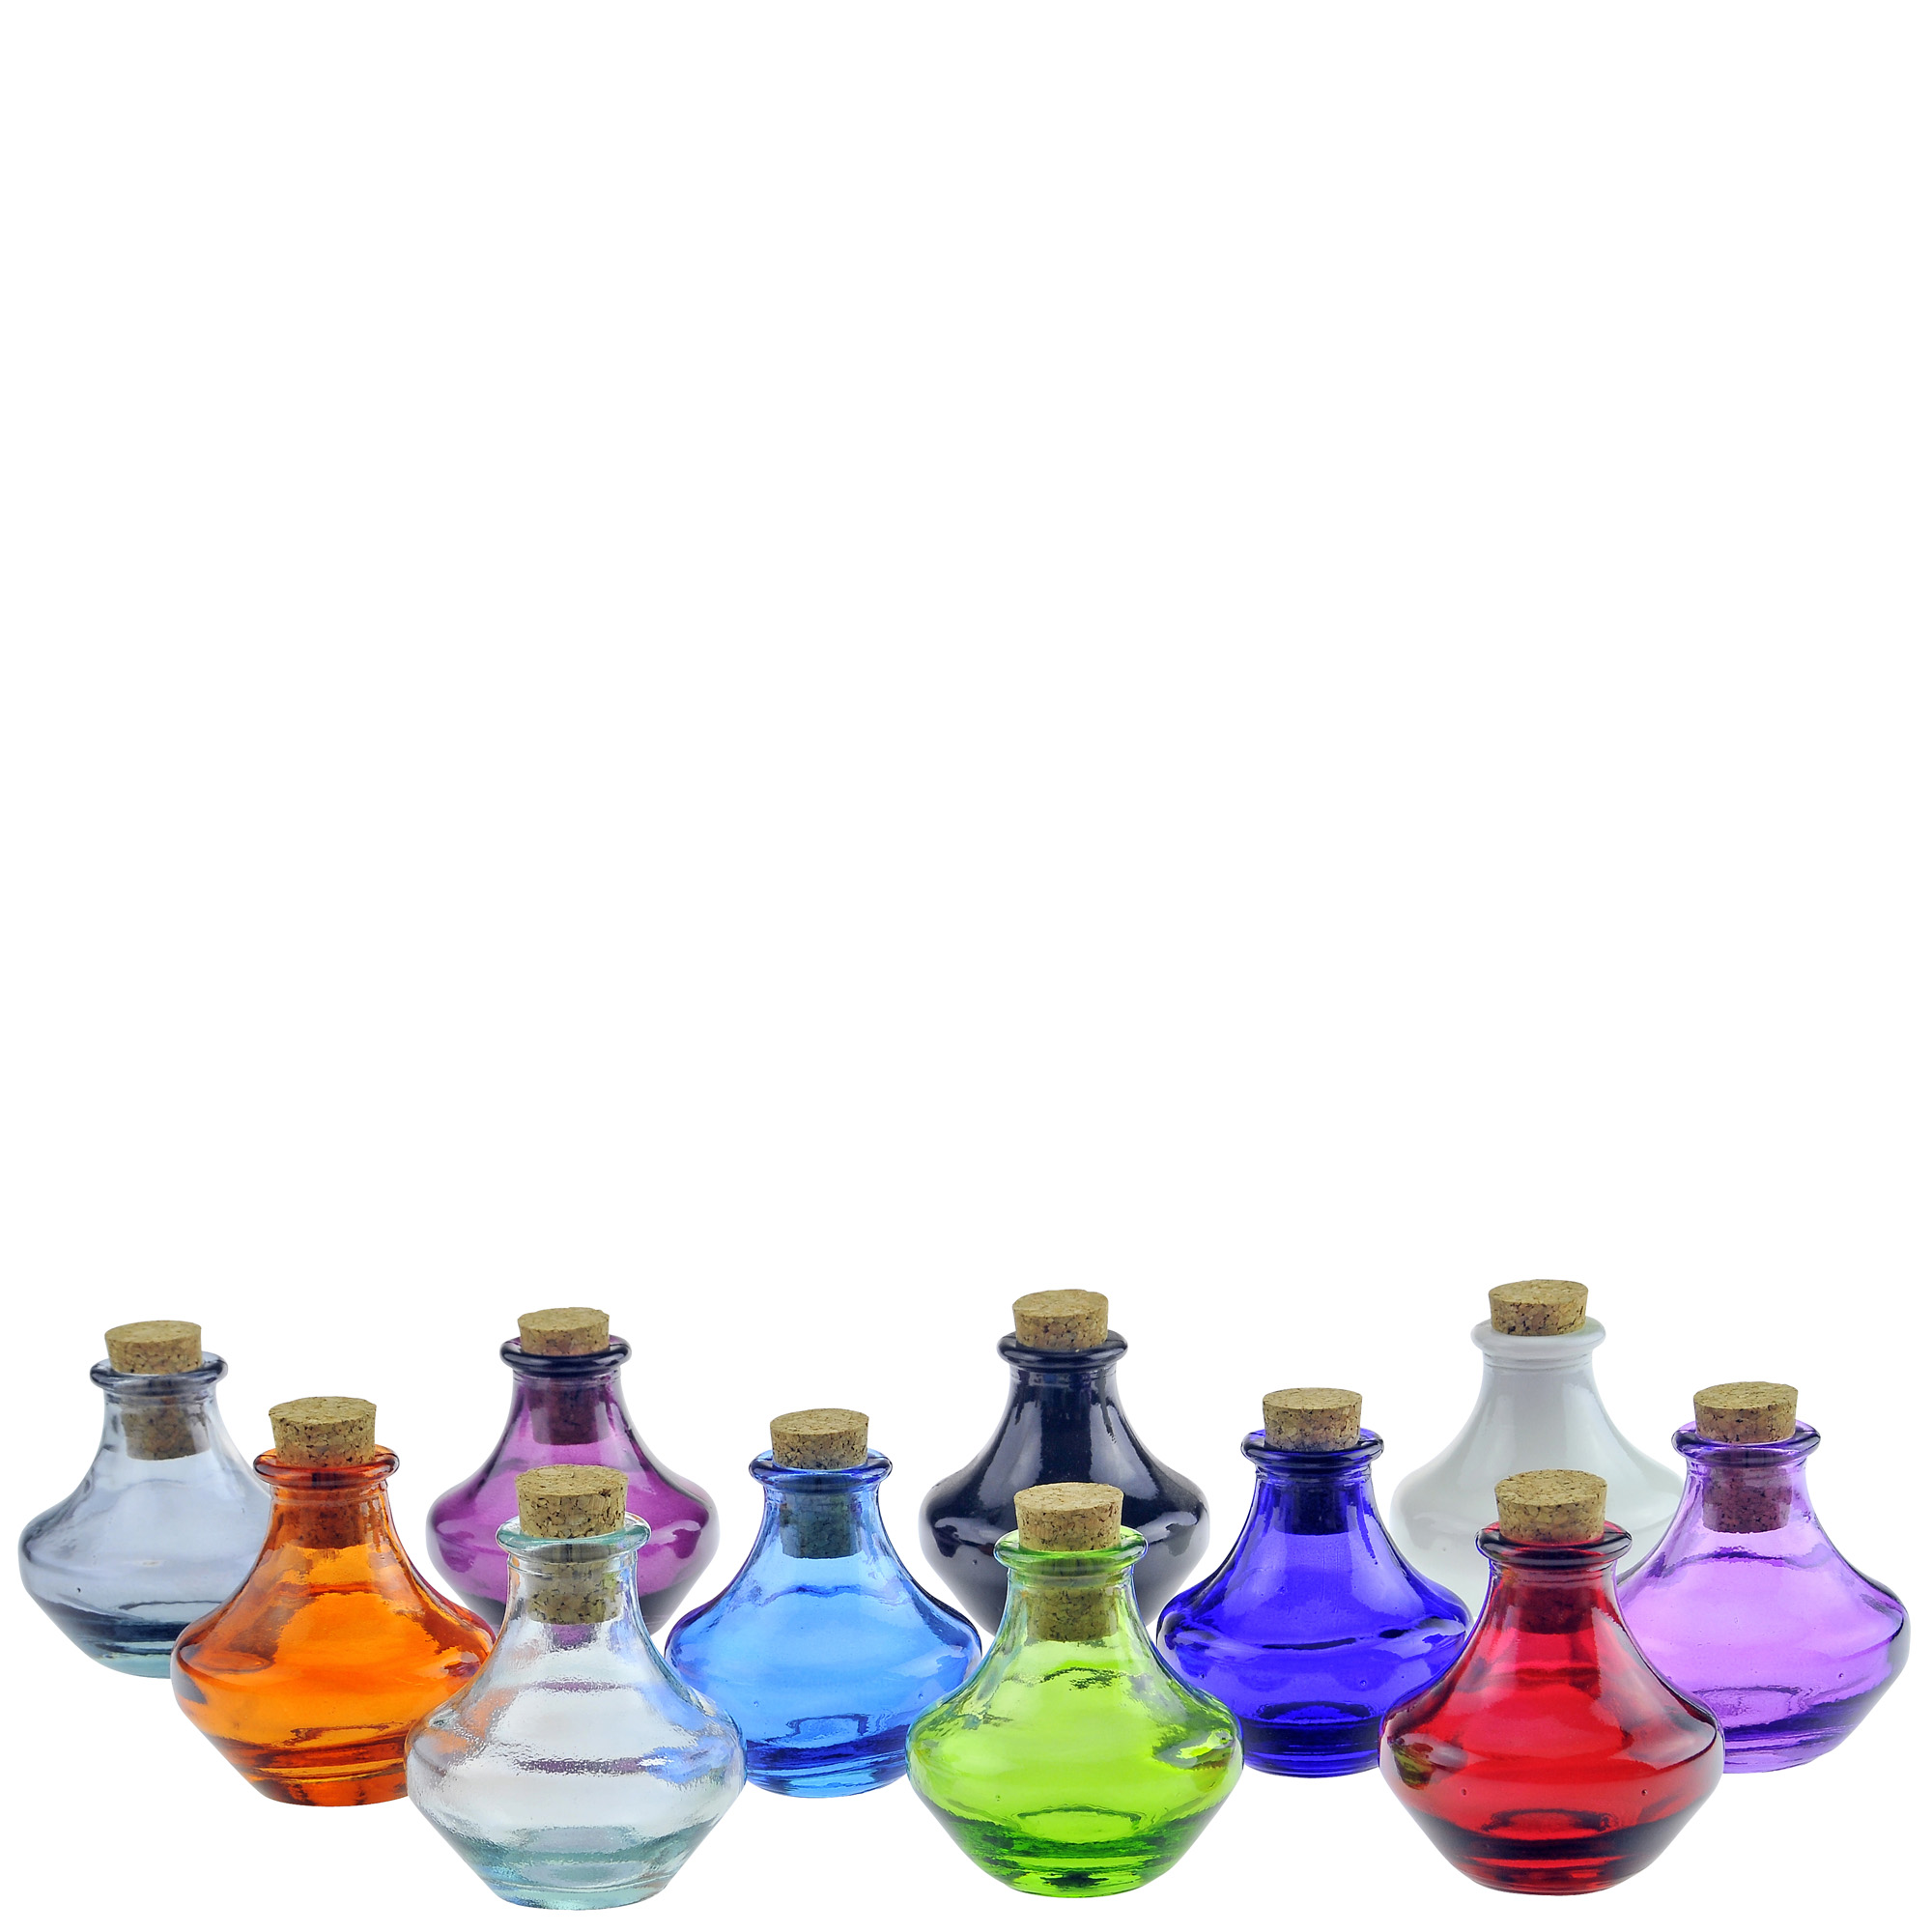 c585330c6c76 Details about Couronne Co Genie Glass Bottle, G5766, 3.7 Ounce Capacity